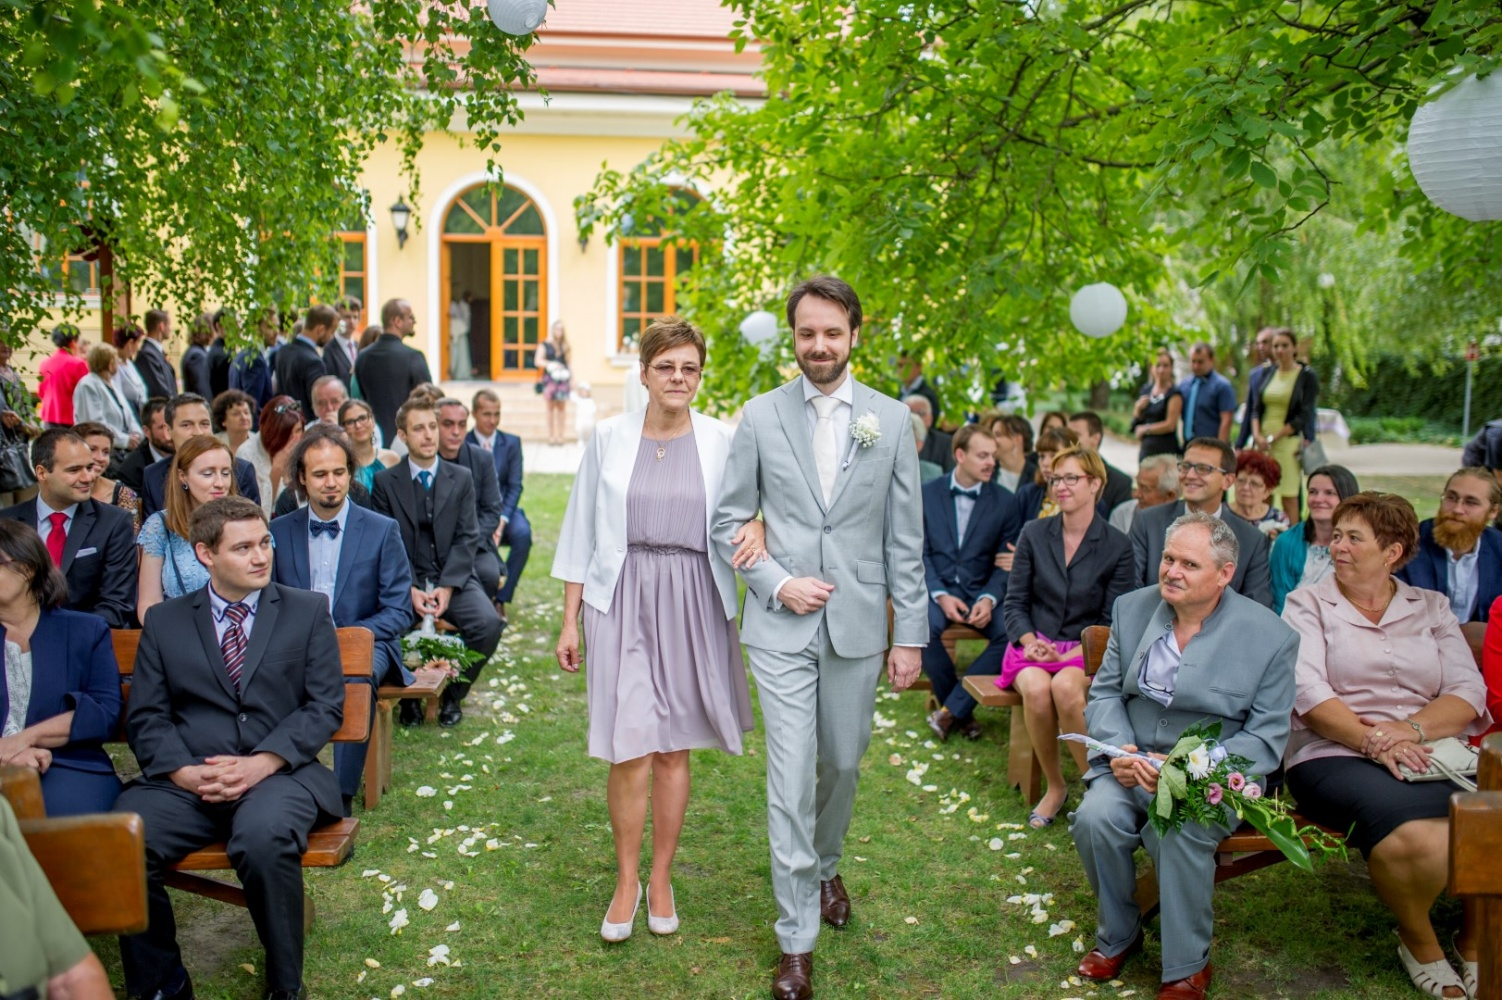 http://www.fotoz.sk/images/gallery-36/normal/svadobny-fotograf_eskuvoi-fotos_lacny-fotograf_fotograf-na-svadbu_plauter-kuria_fotograf-nitra_fotograf-galanta_juraj-zsok123.jpg